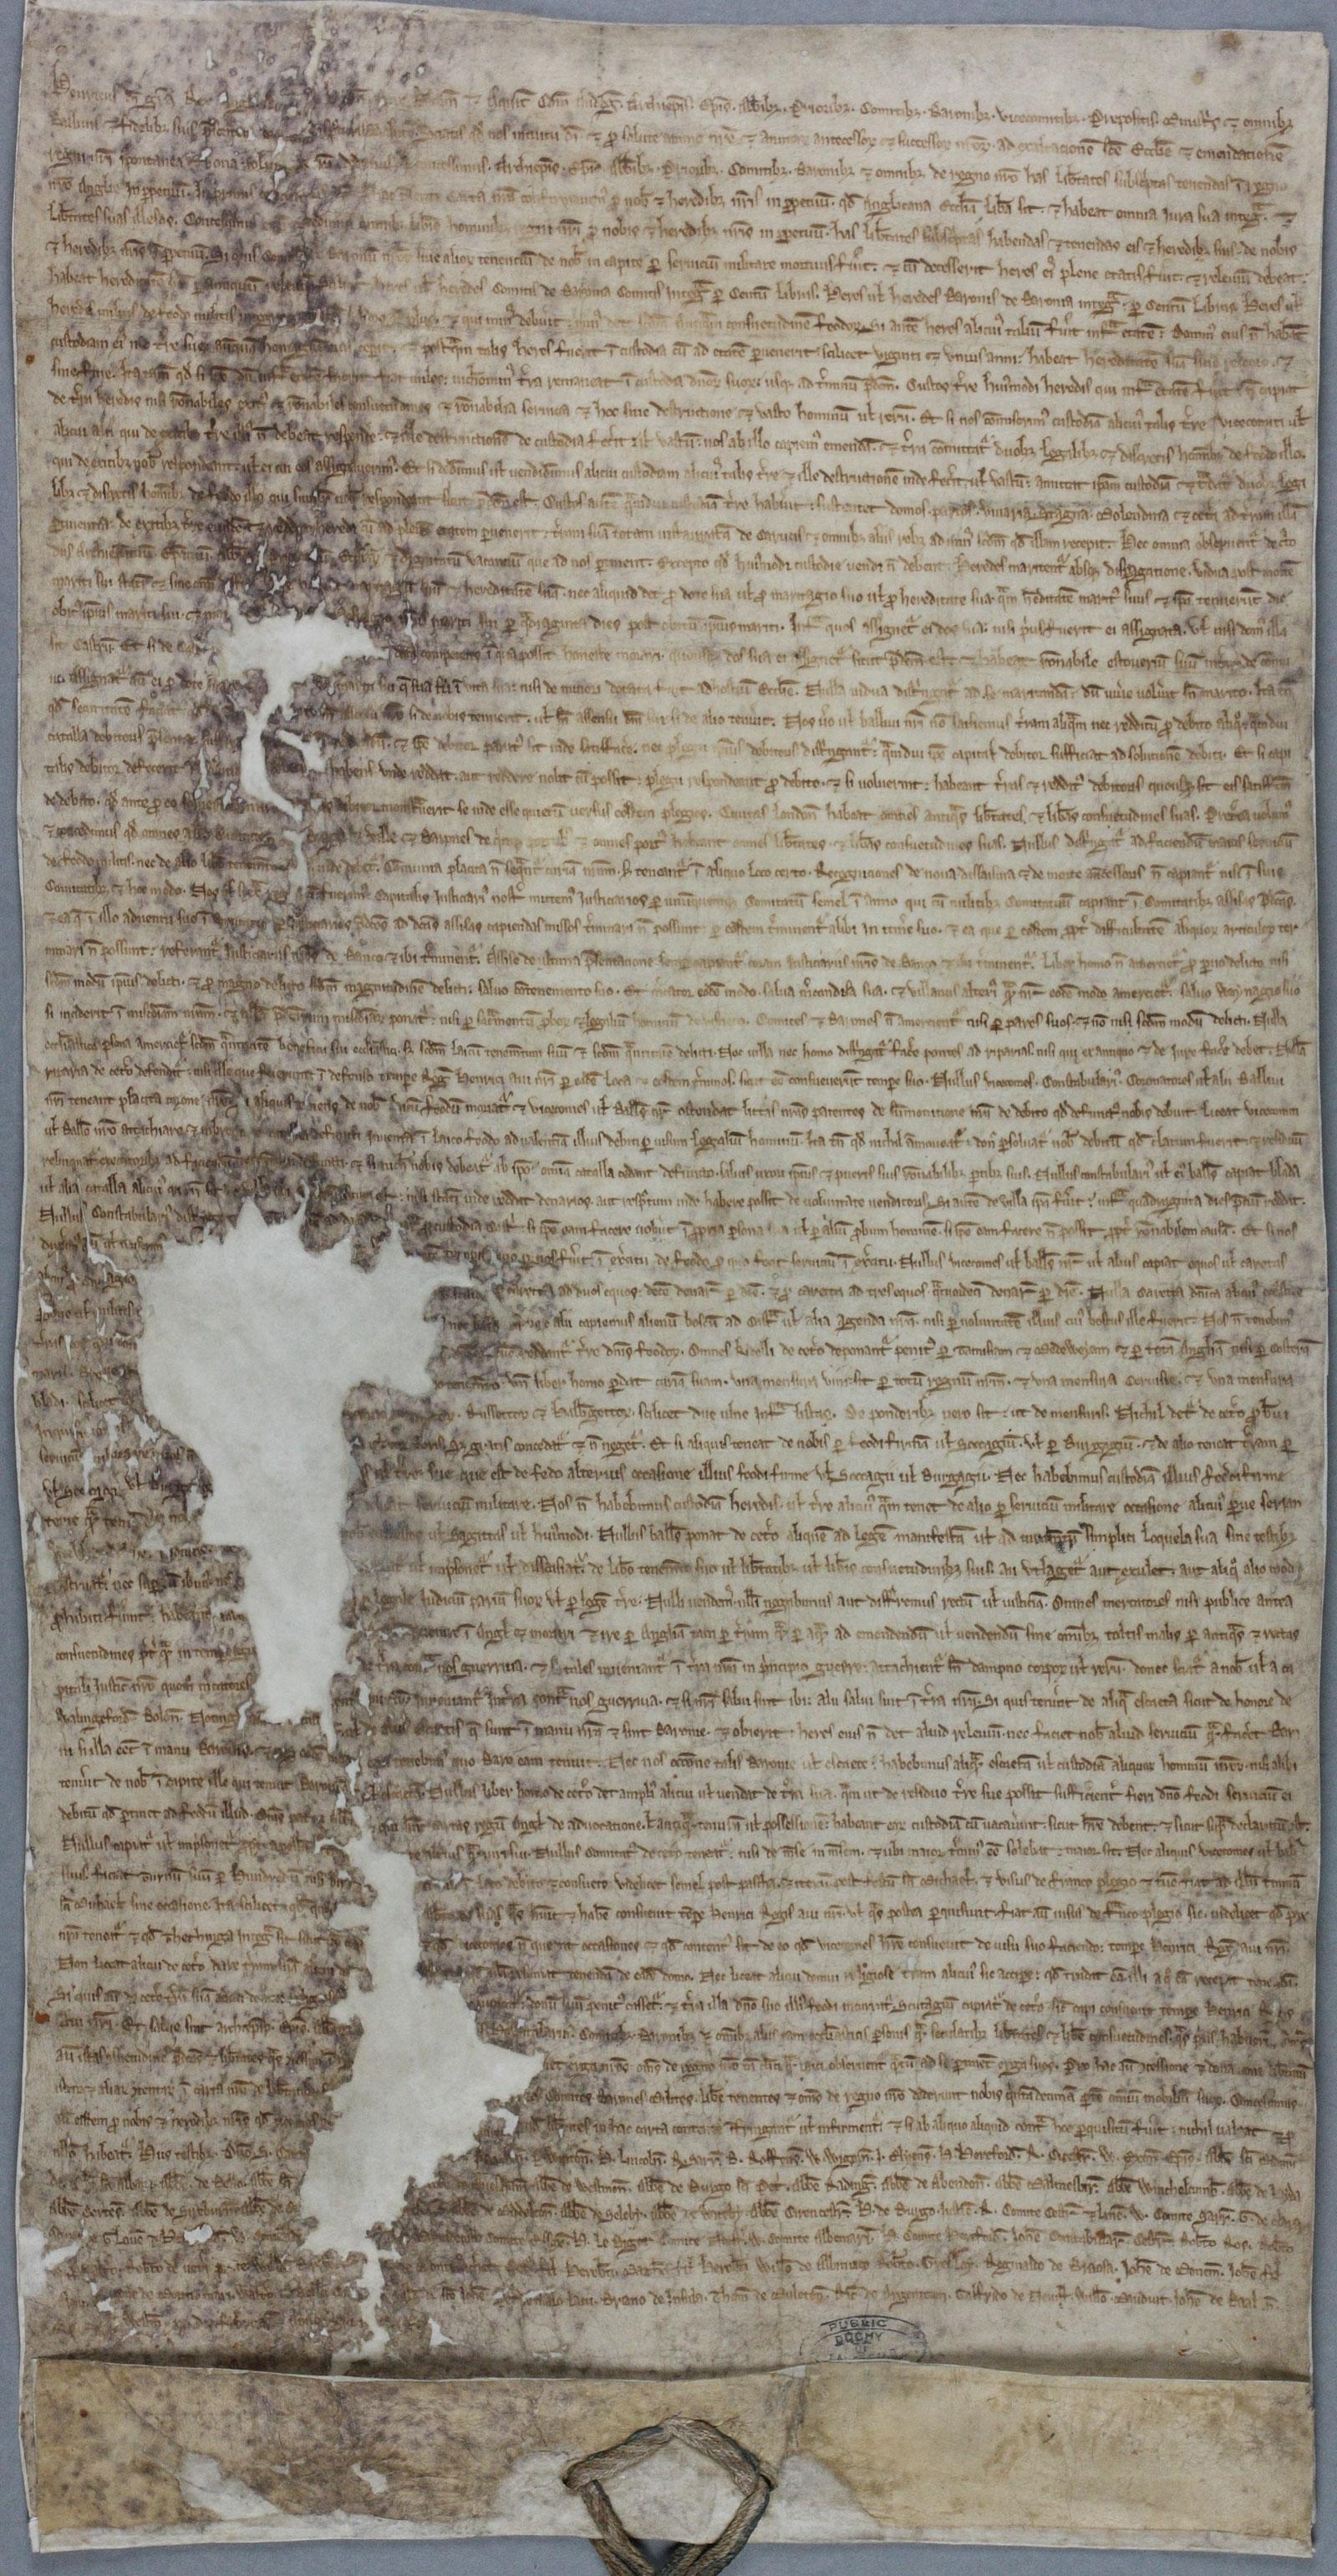 Magna Carta, 1225, Westminster (DL 10/71)